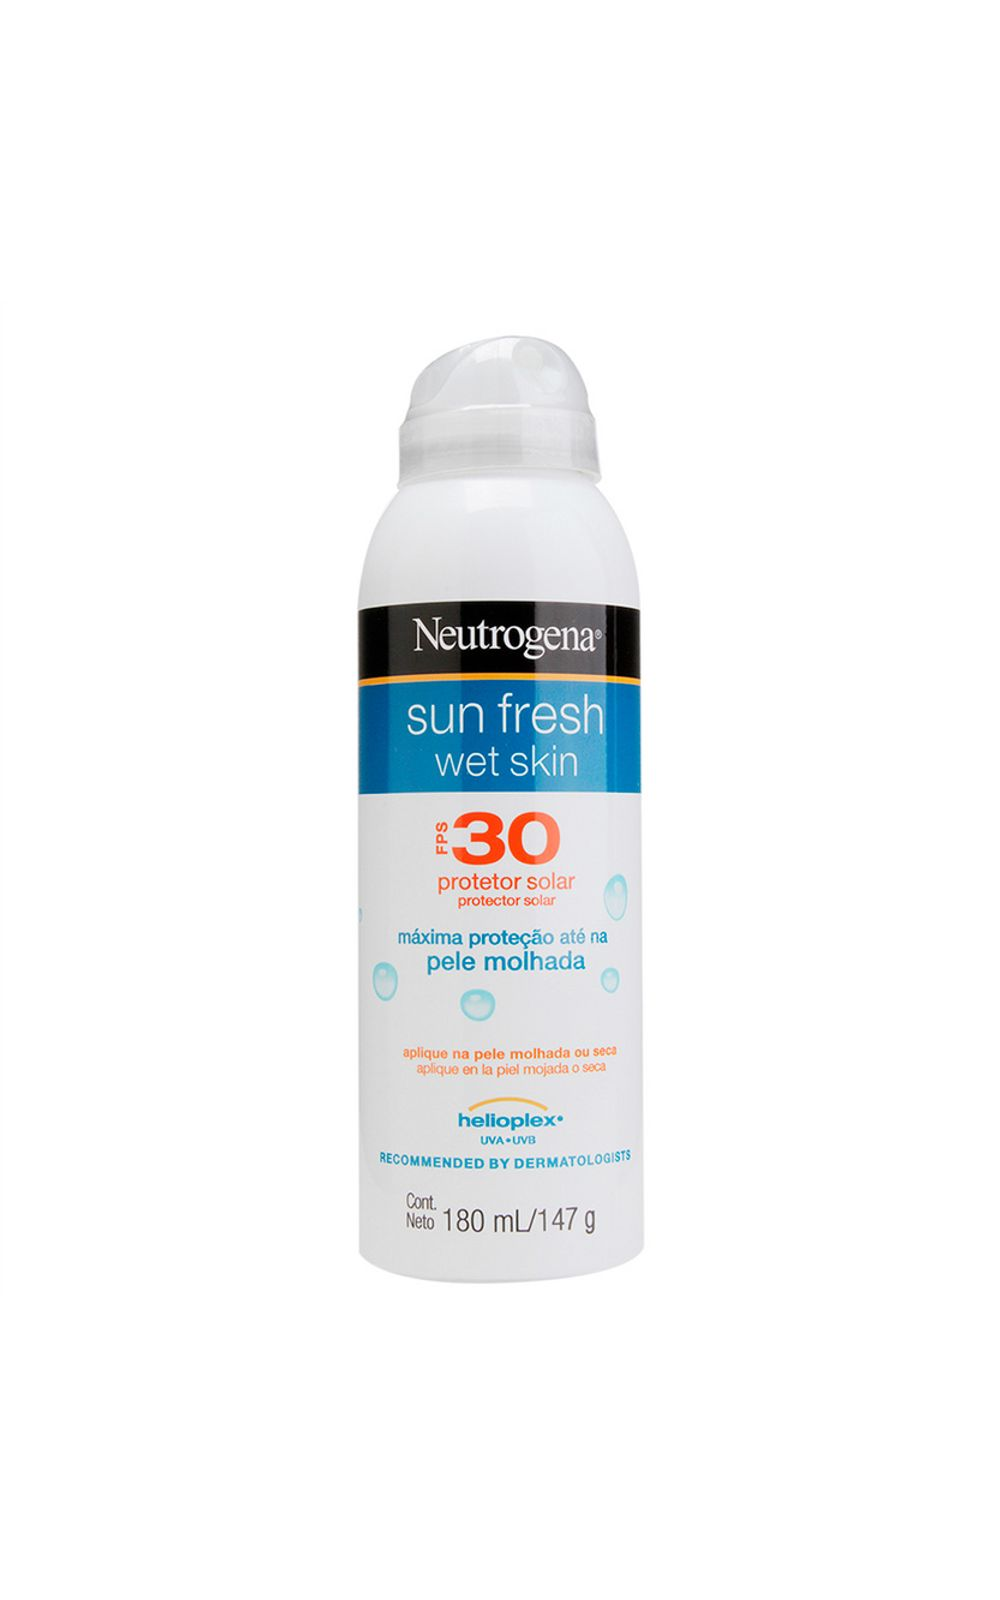 Foto 1 - Protetor Solar Neutrogena Sun Fresh Wet Skin FPS 30 - 180ml